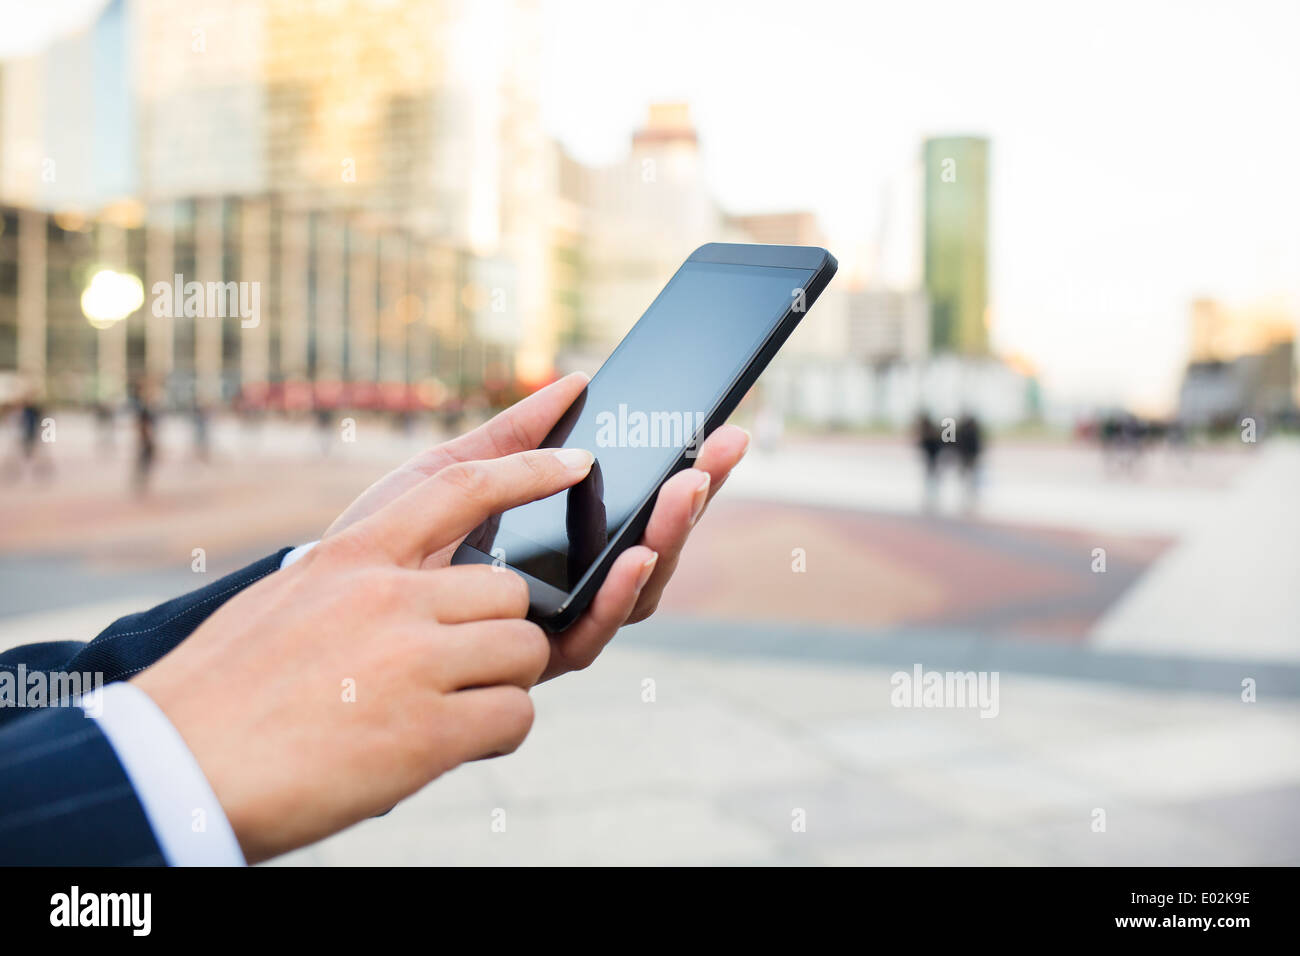 Femmina cellulare a mano outdoor sms messaggi e-mail Immagini Stock